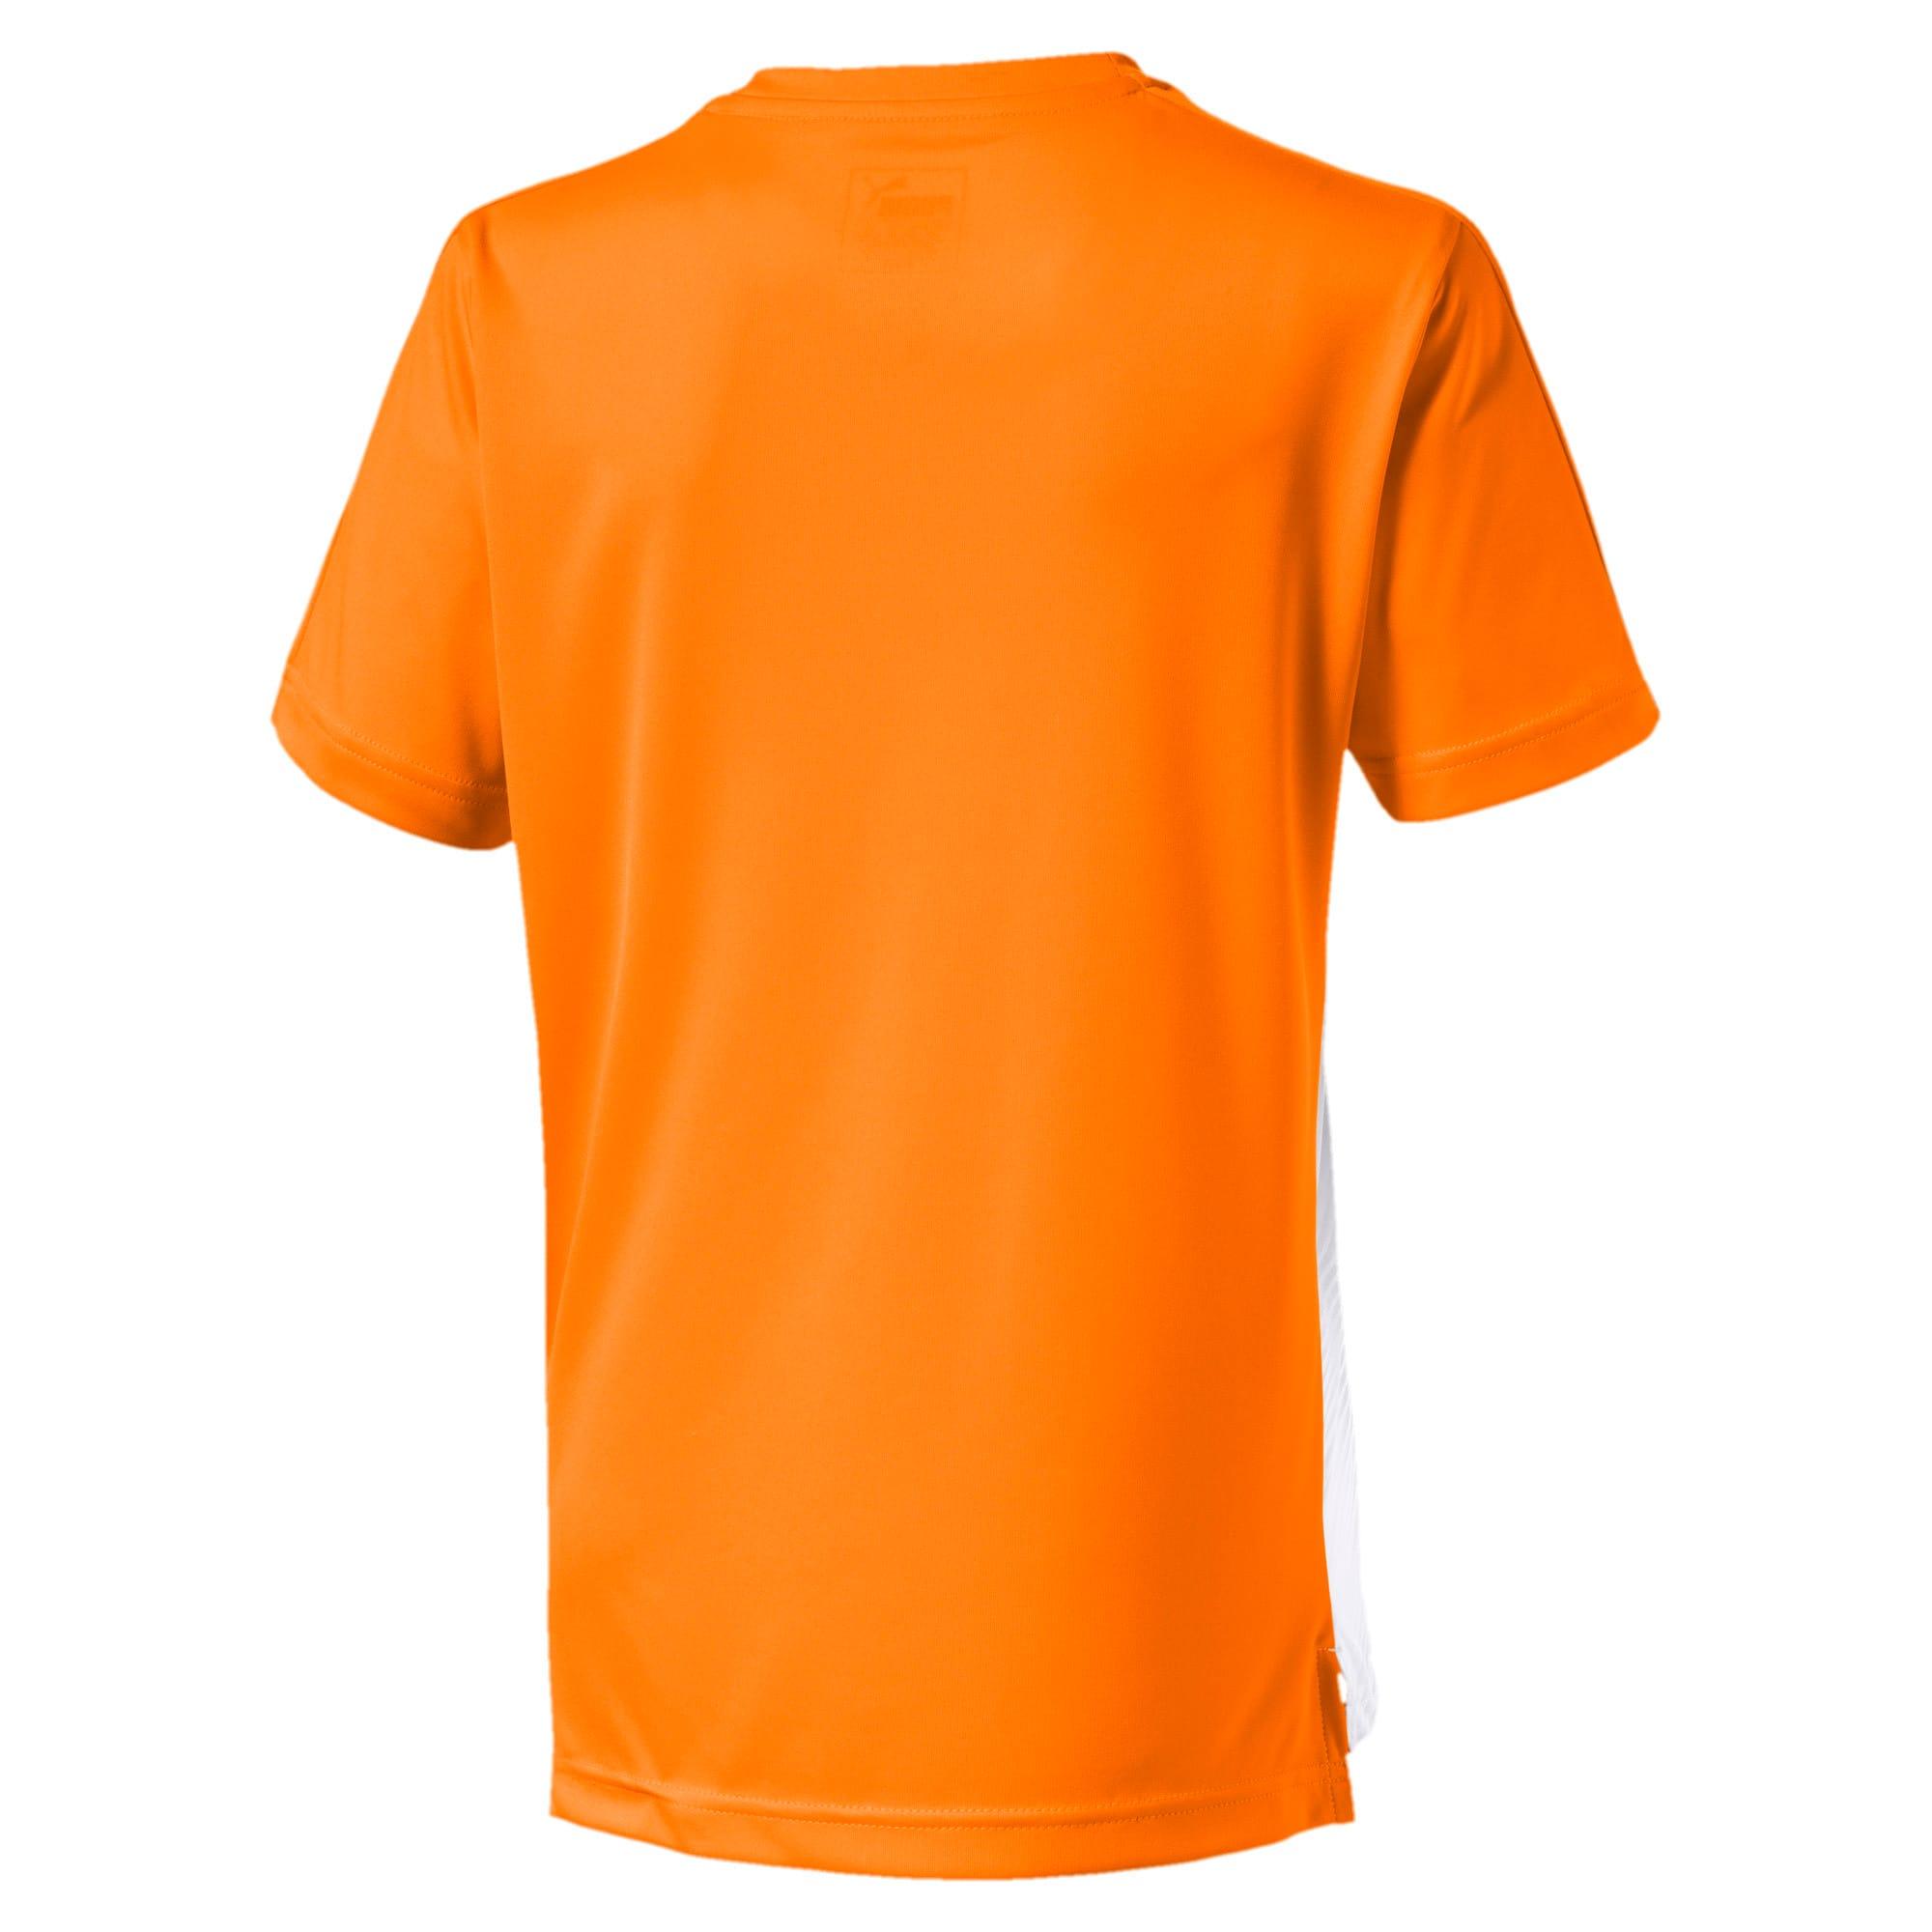 Thumbnail 2 of Valencia CF Kids' Stadium Jersey, Vibrant Orange-Puma White, medium